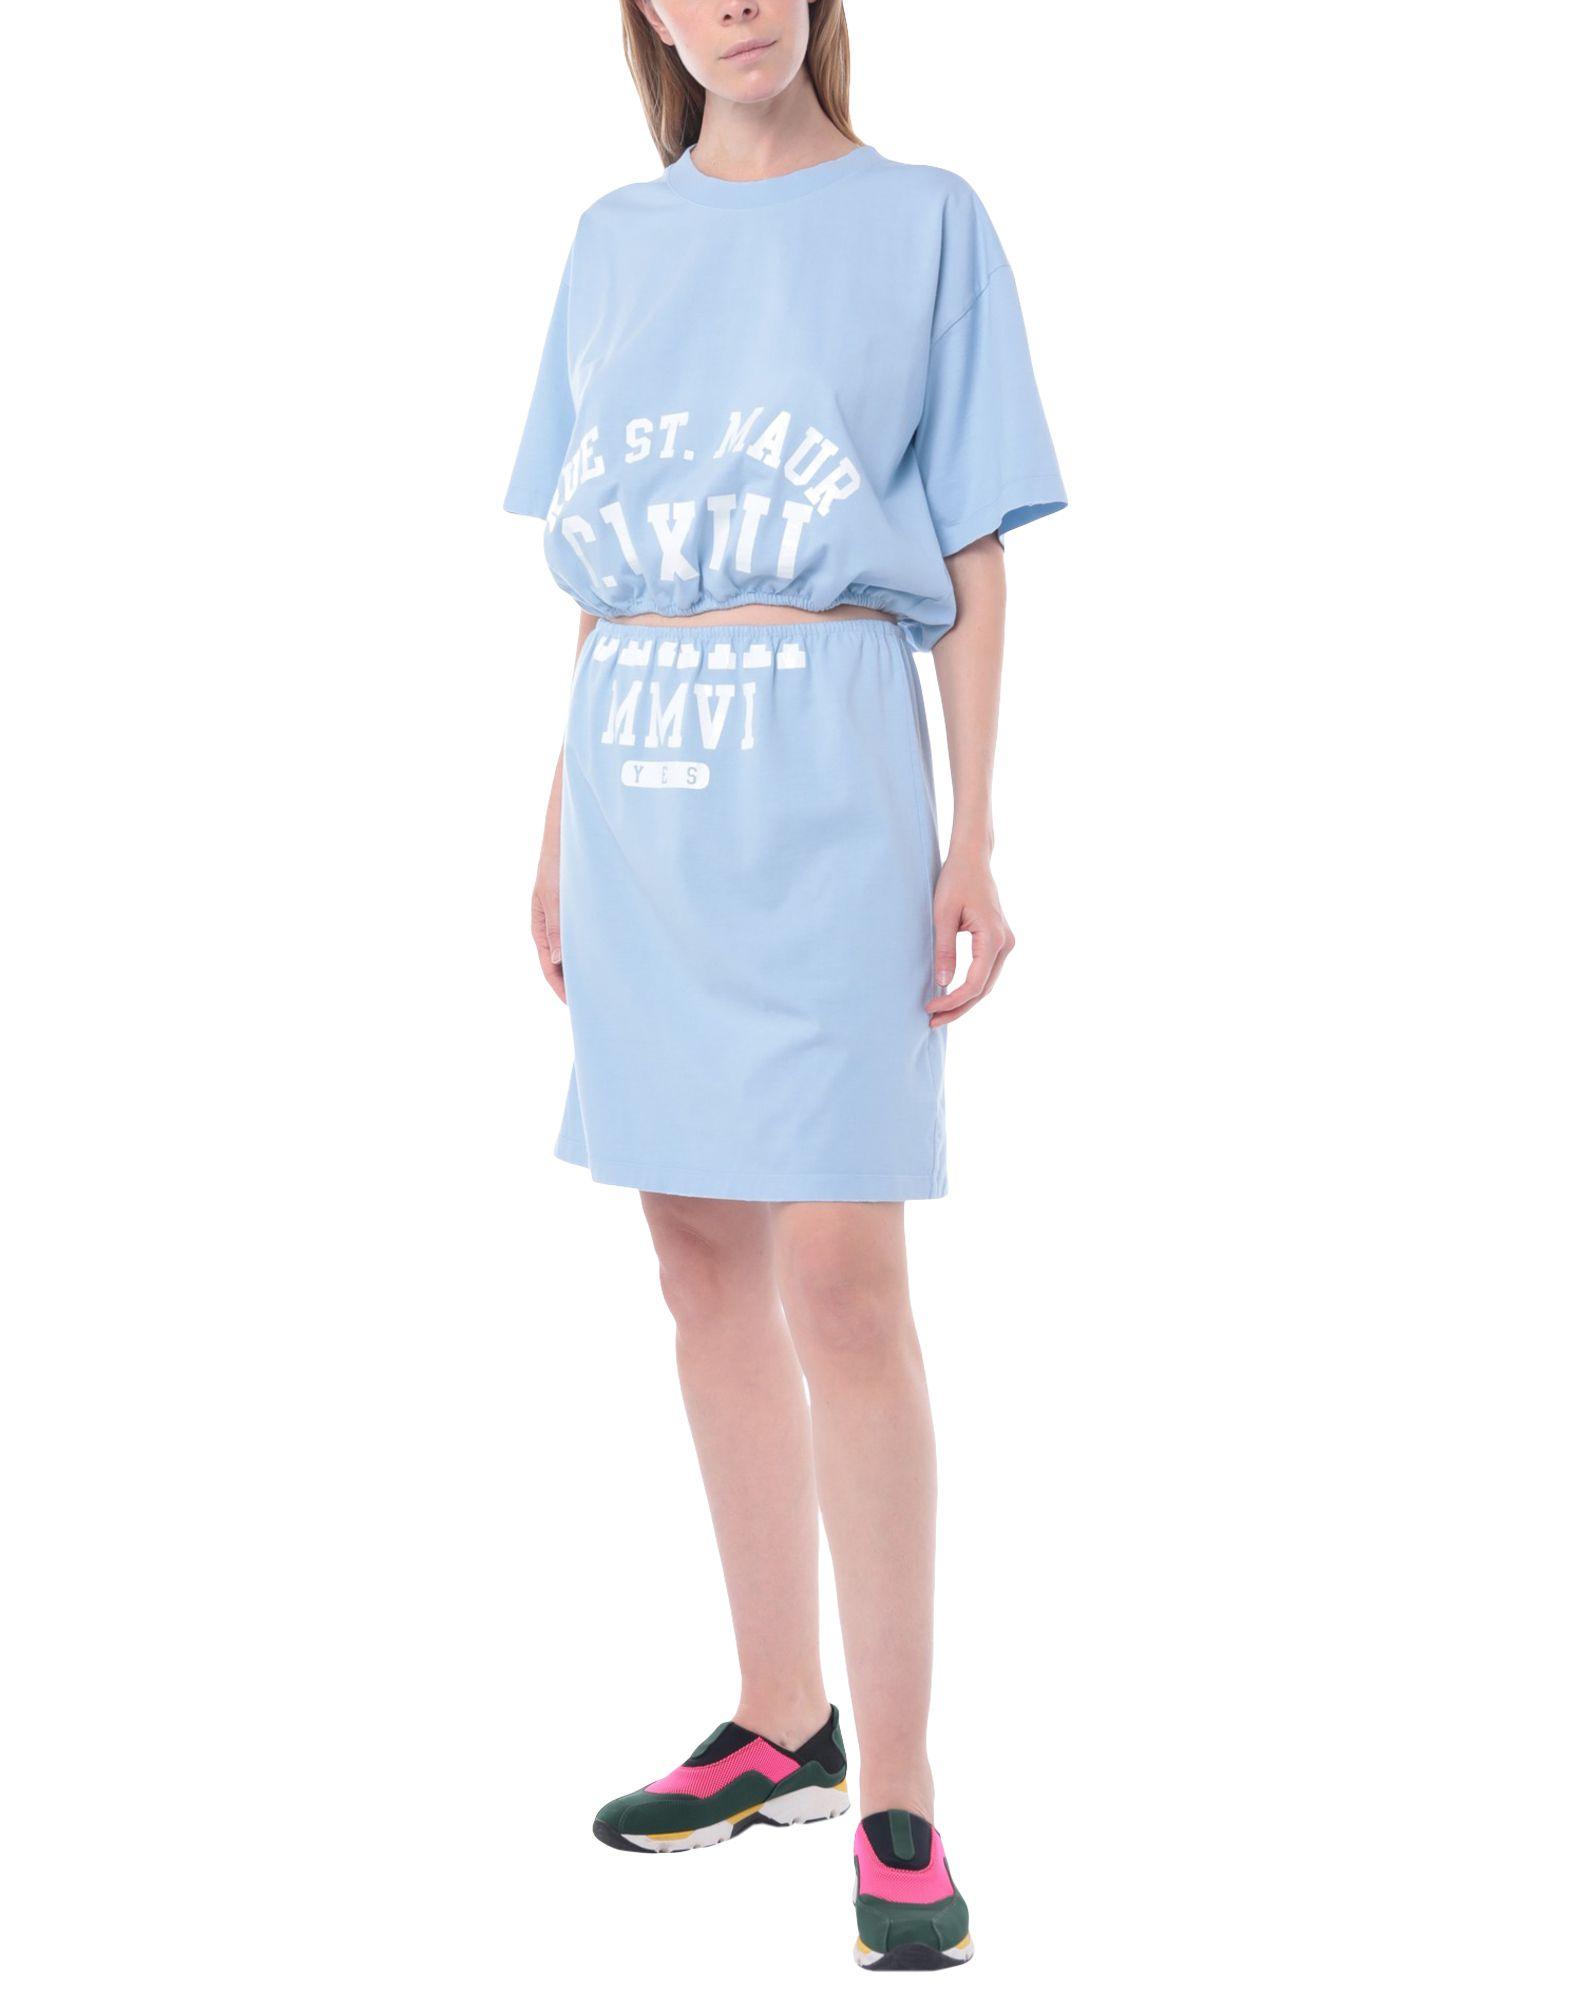 MM6 MAISON MARGIELA Tracksuits. jersey, print, logo, solid color, round collar, no pockets, short sleeves, 2-piece set. 100% Cotton, Elastane